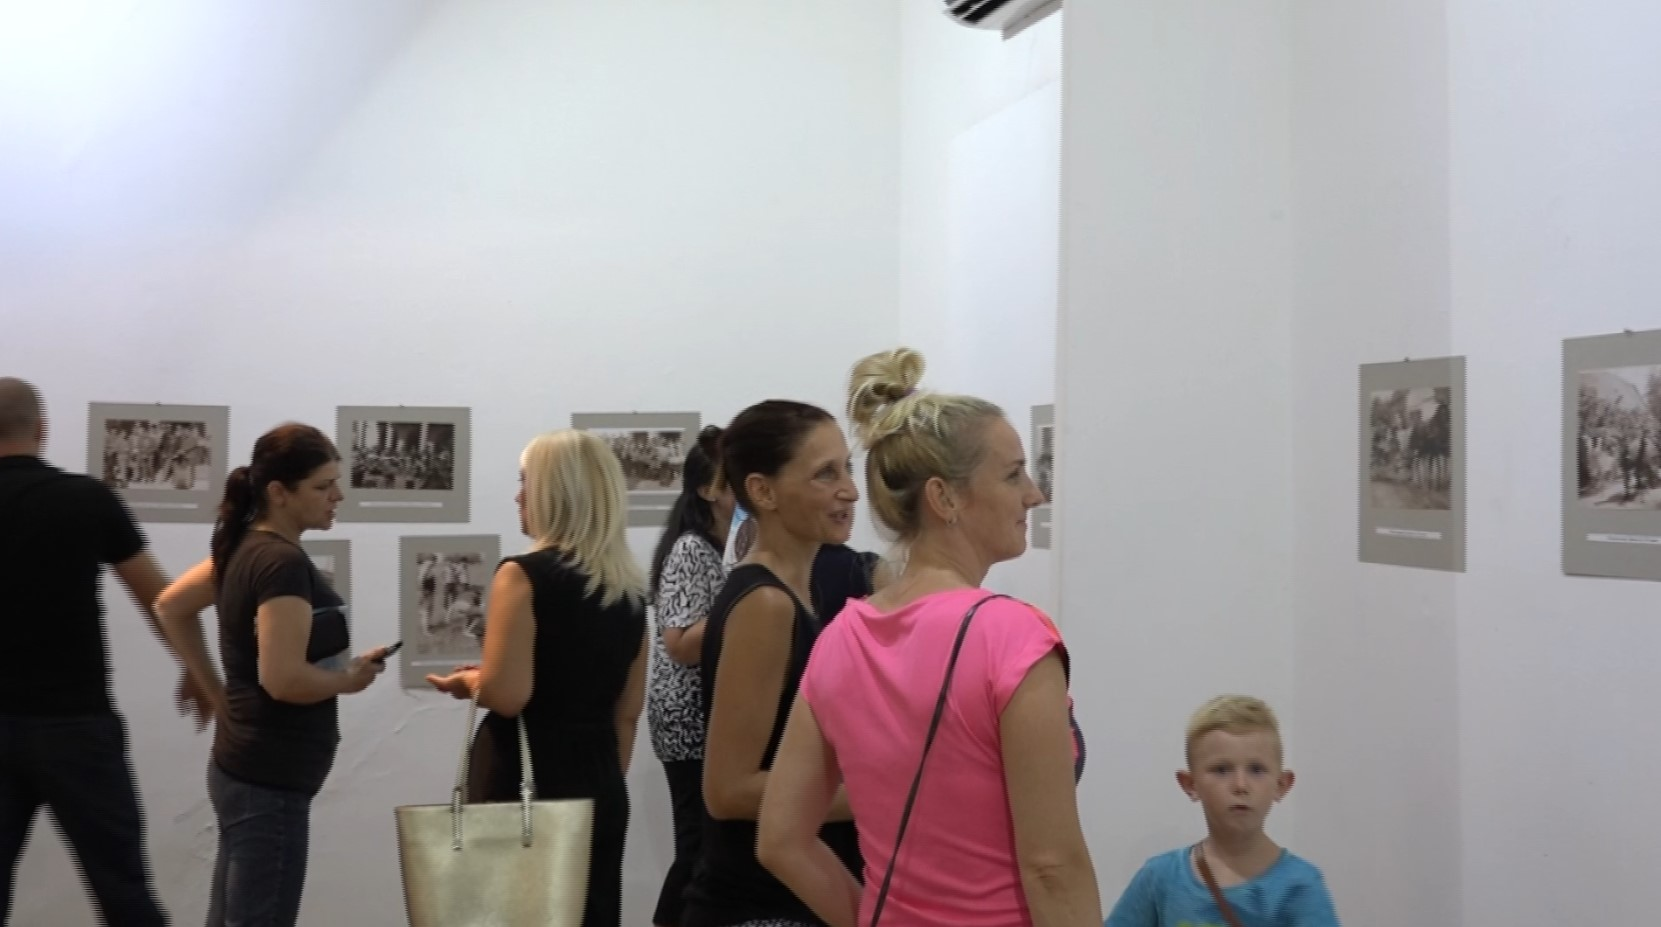 Izložba fotografija Vračev Gaj u prošlosti